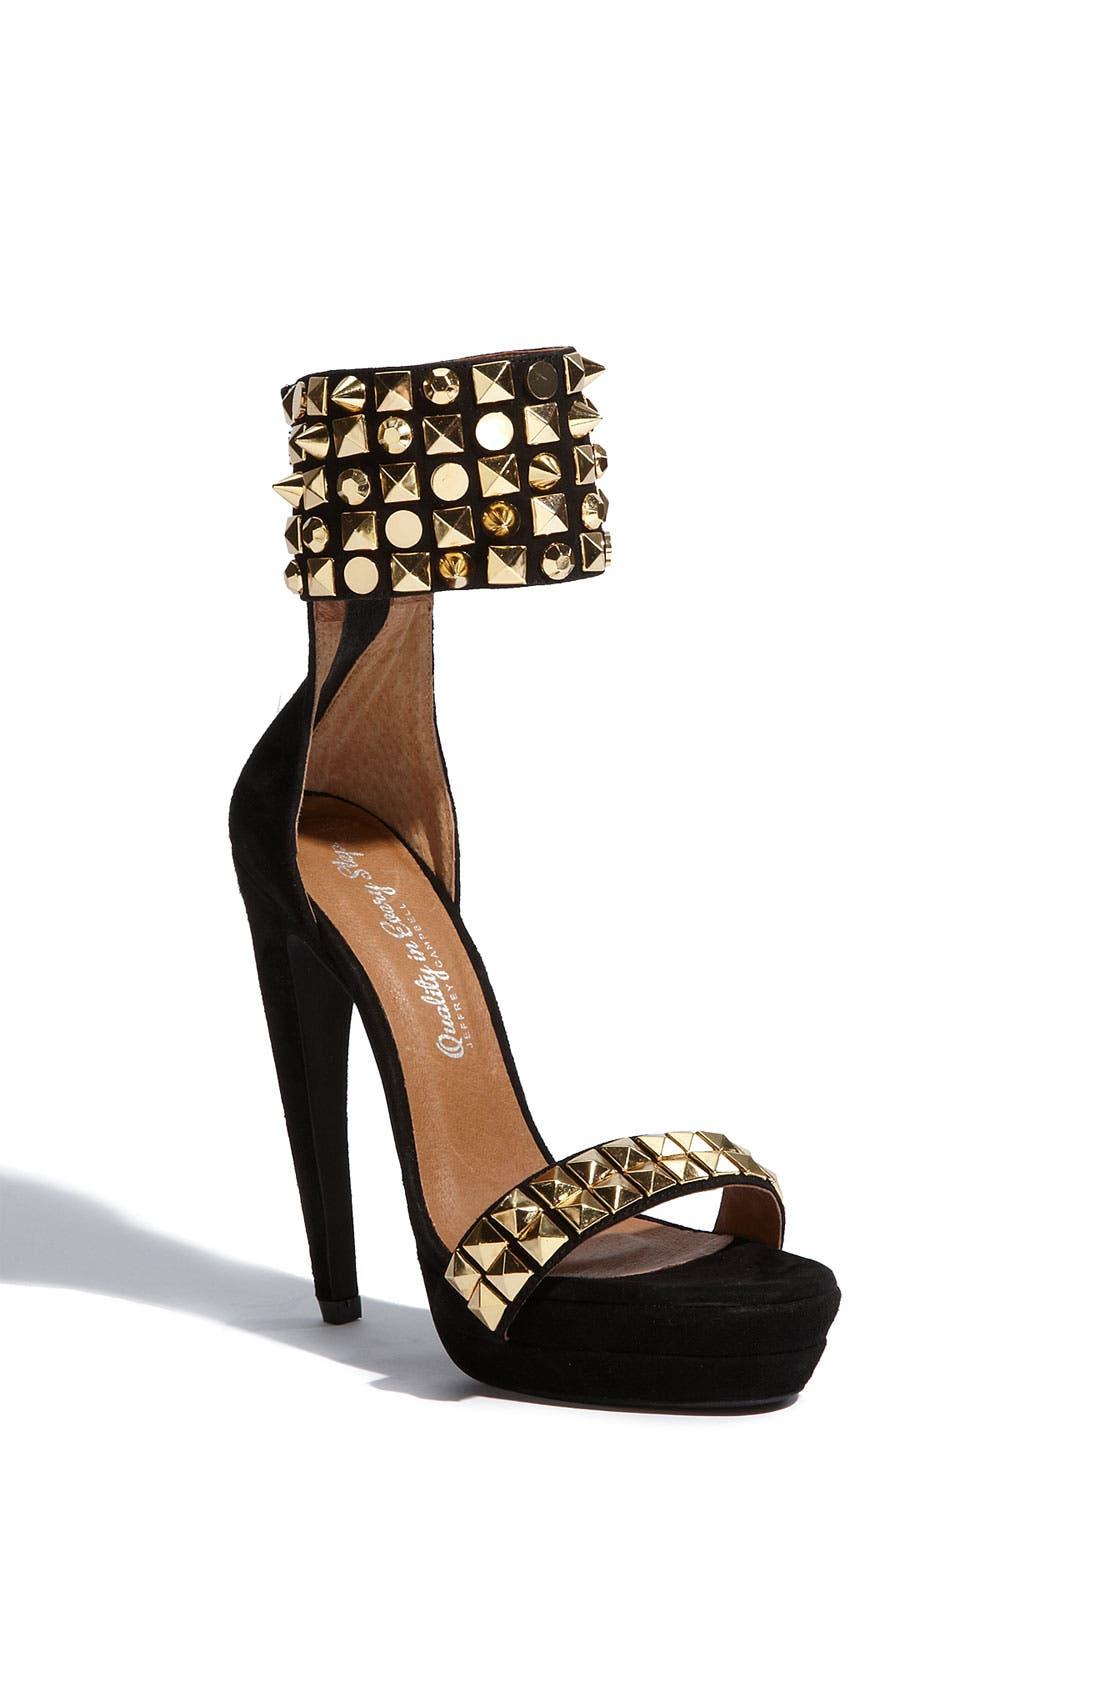 Main Image - Jeffrey Campbell 'Kylie' Sandal